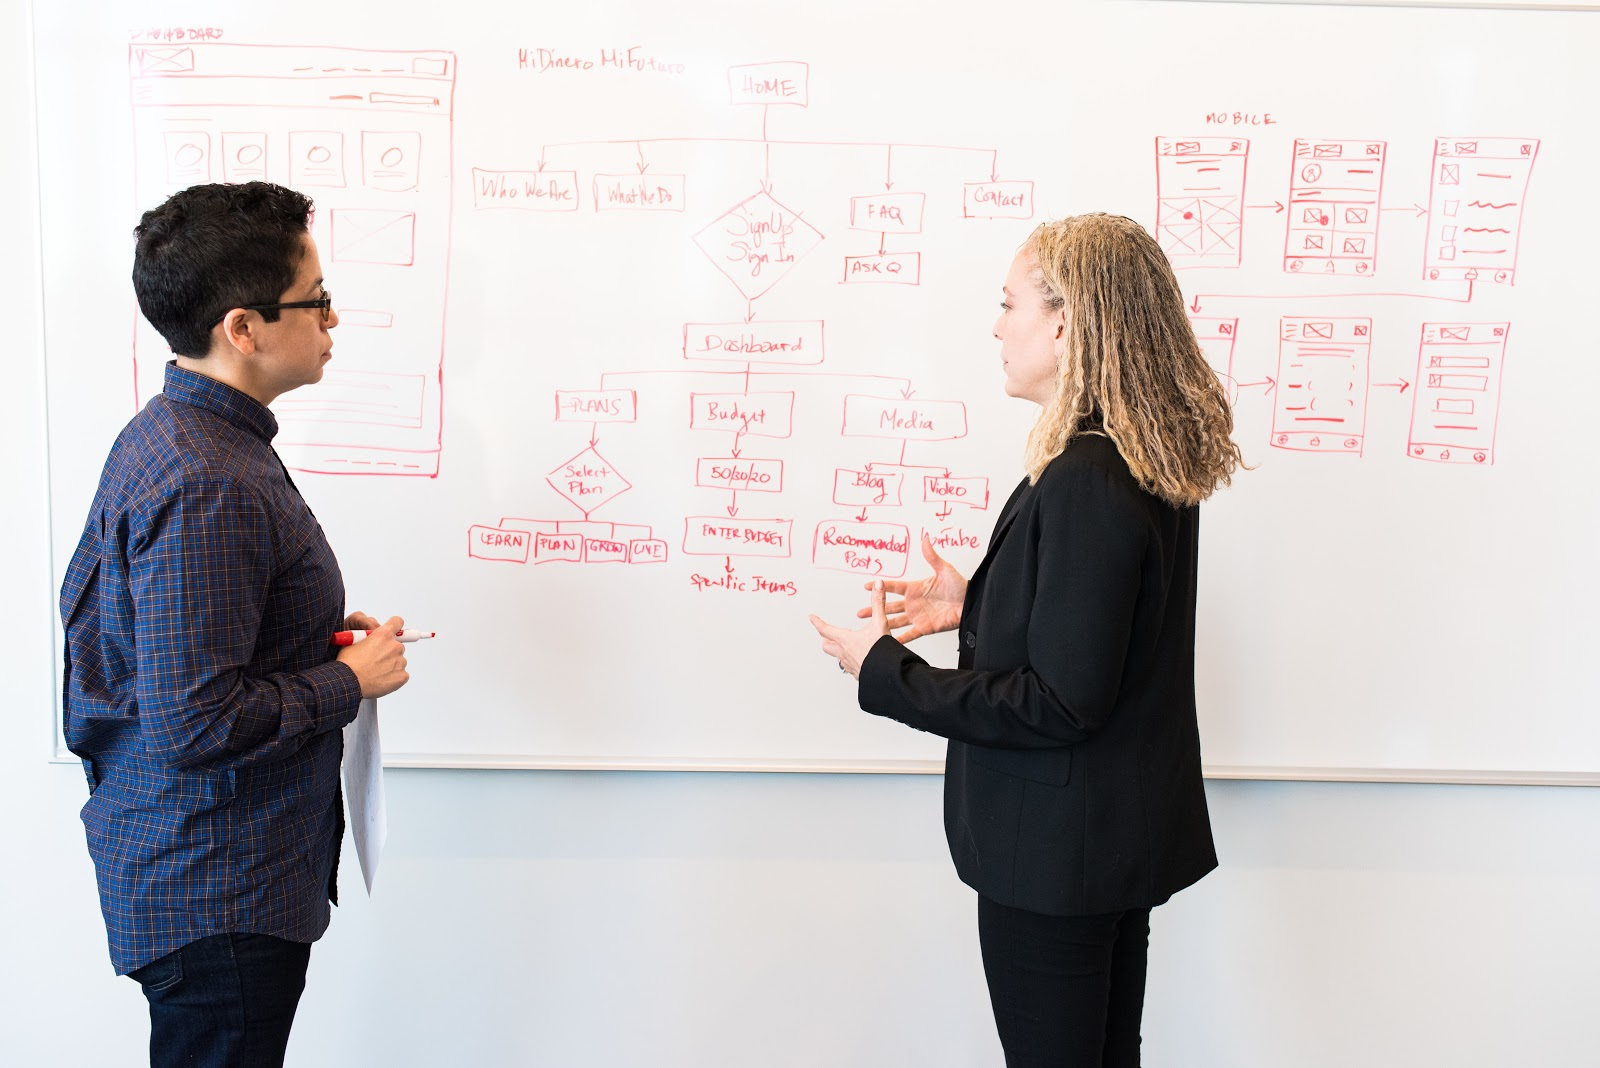 Two people work on a UI/UX flowchart